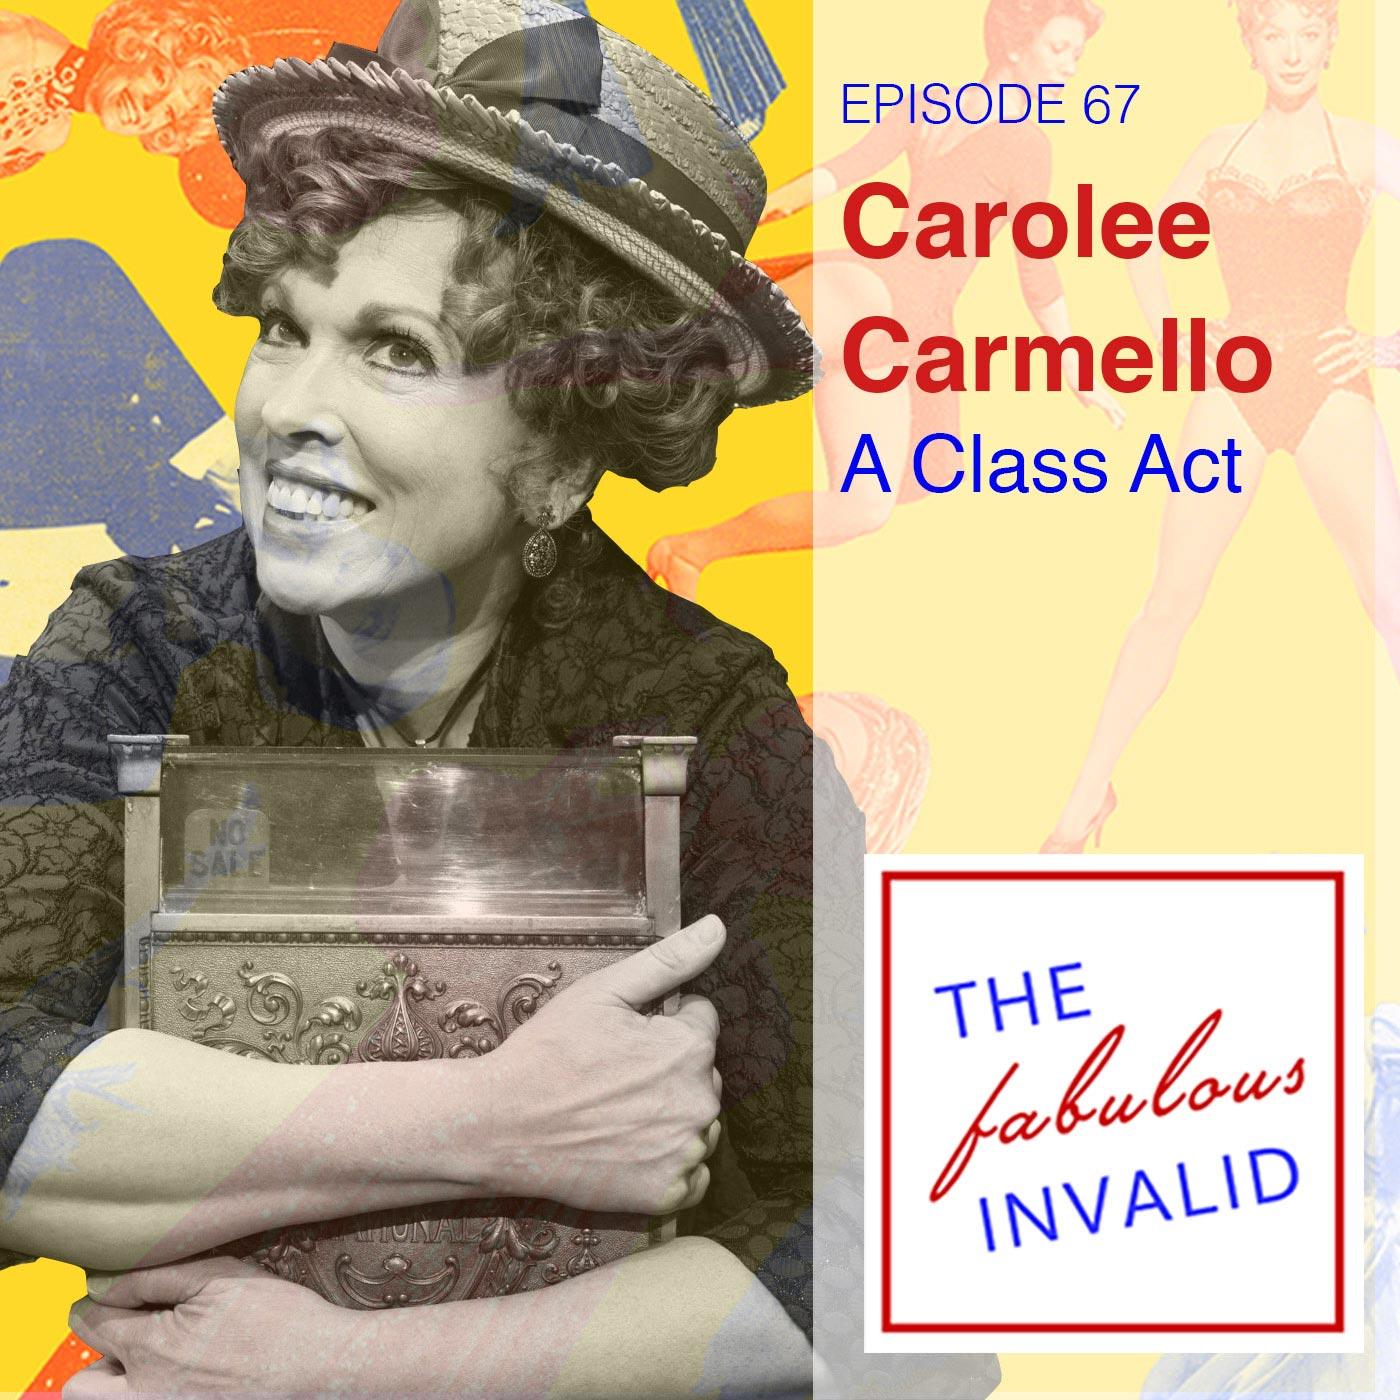 The Fabulous Invalid Episode 67 Carolee Carmello